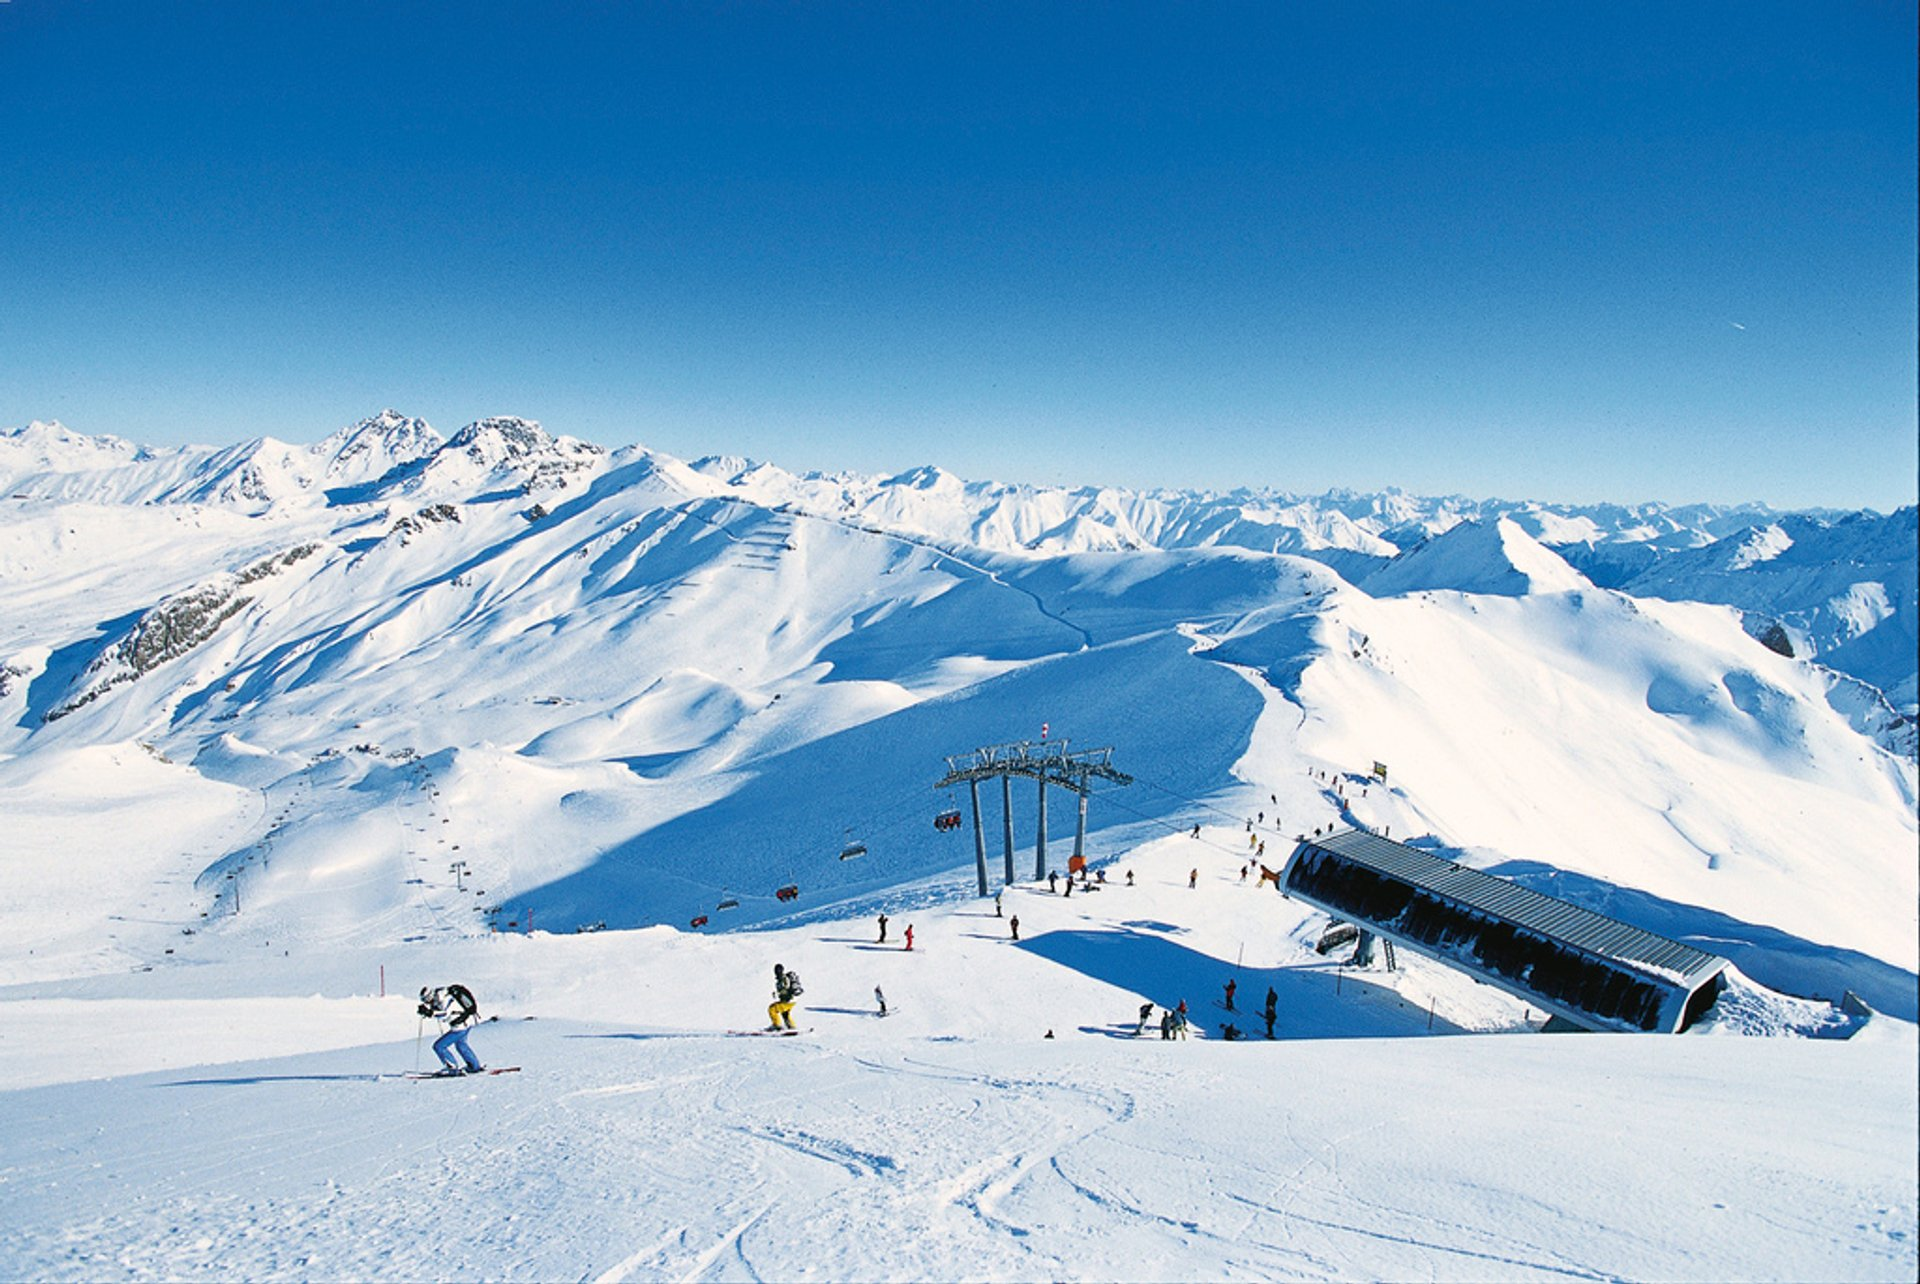 Ischgl, Austria 2020